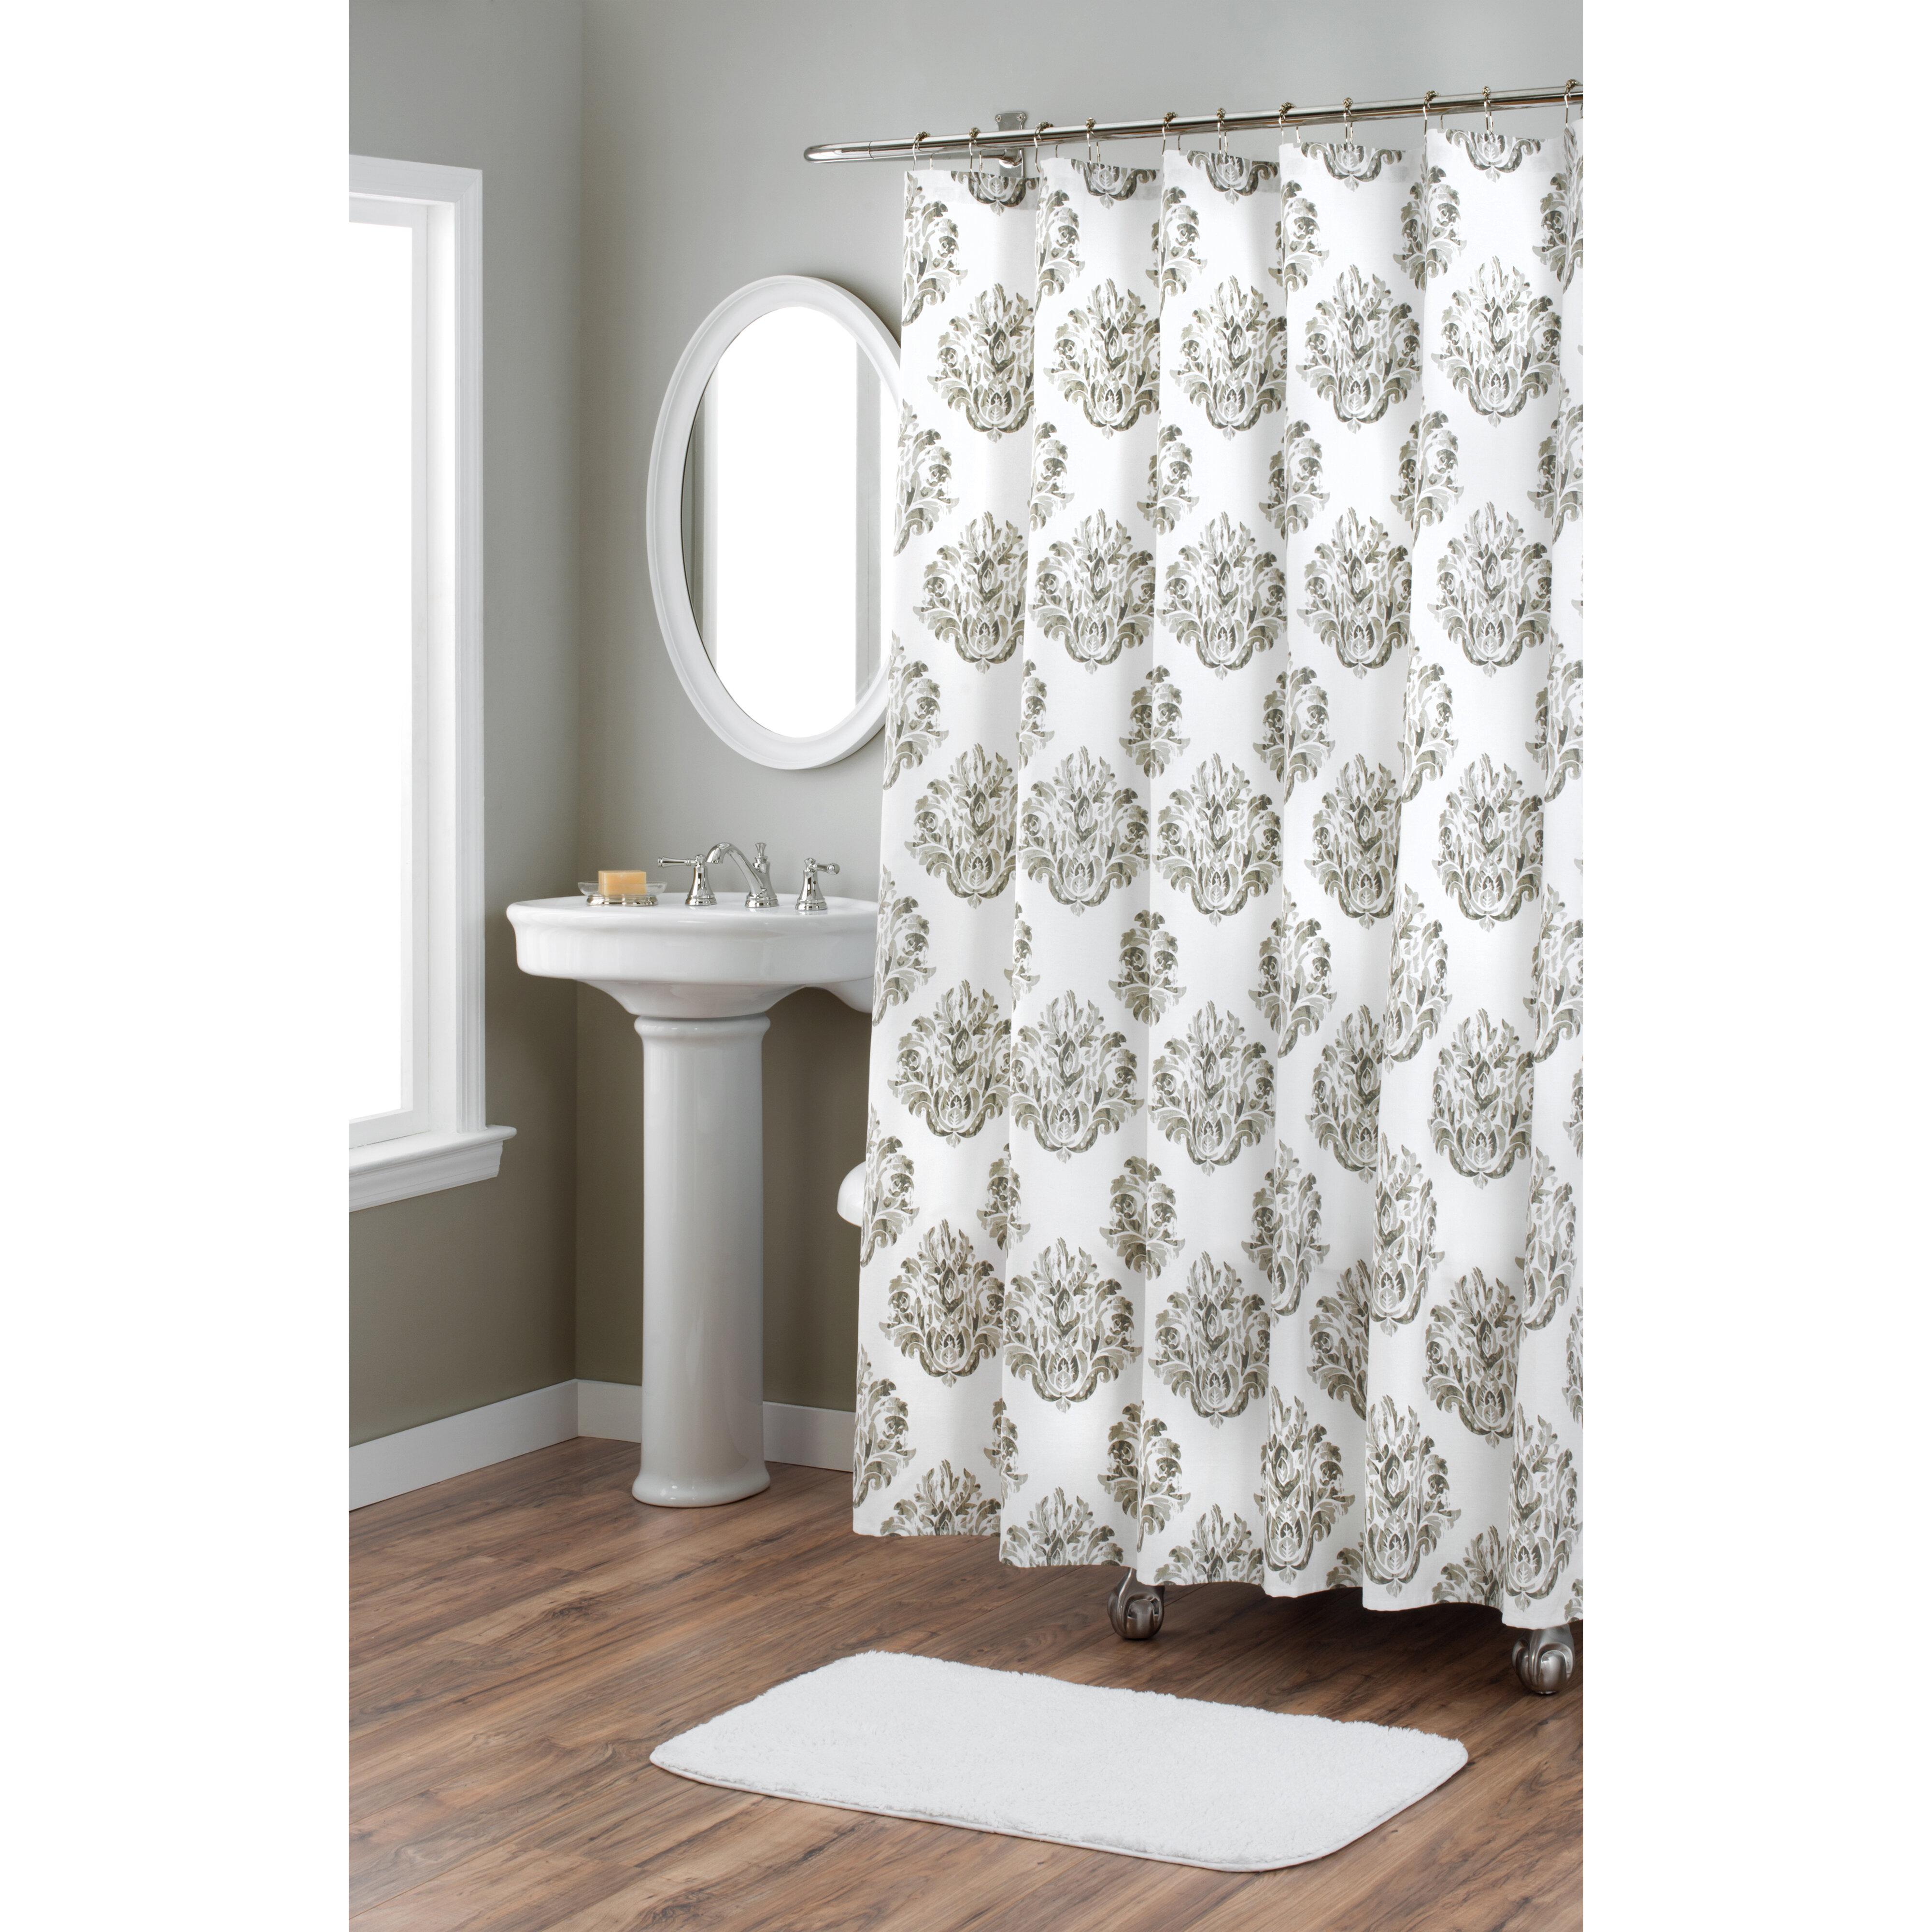 Nicole Miller Damask Cotton Shower Curtain